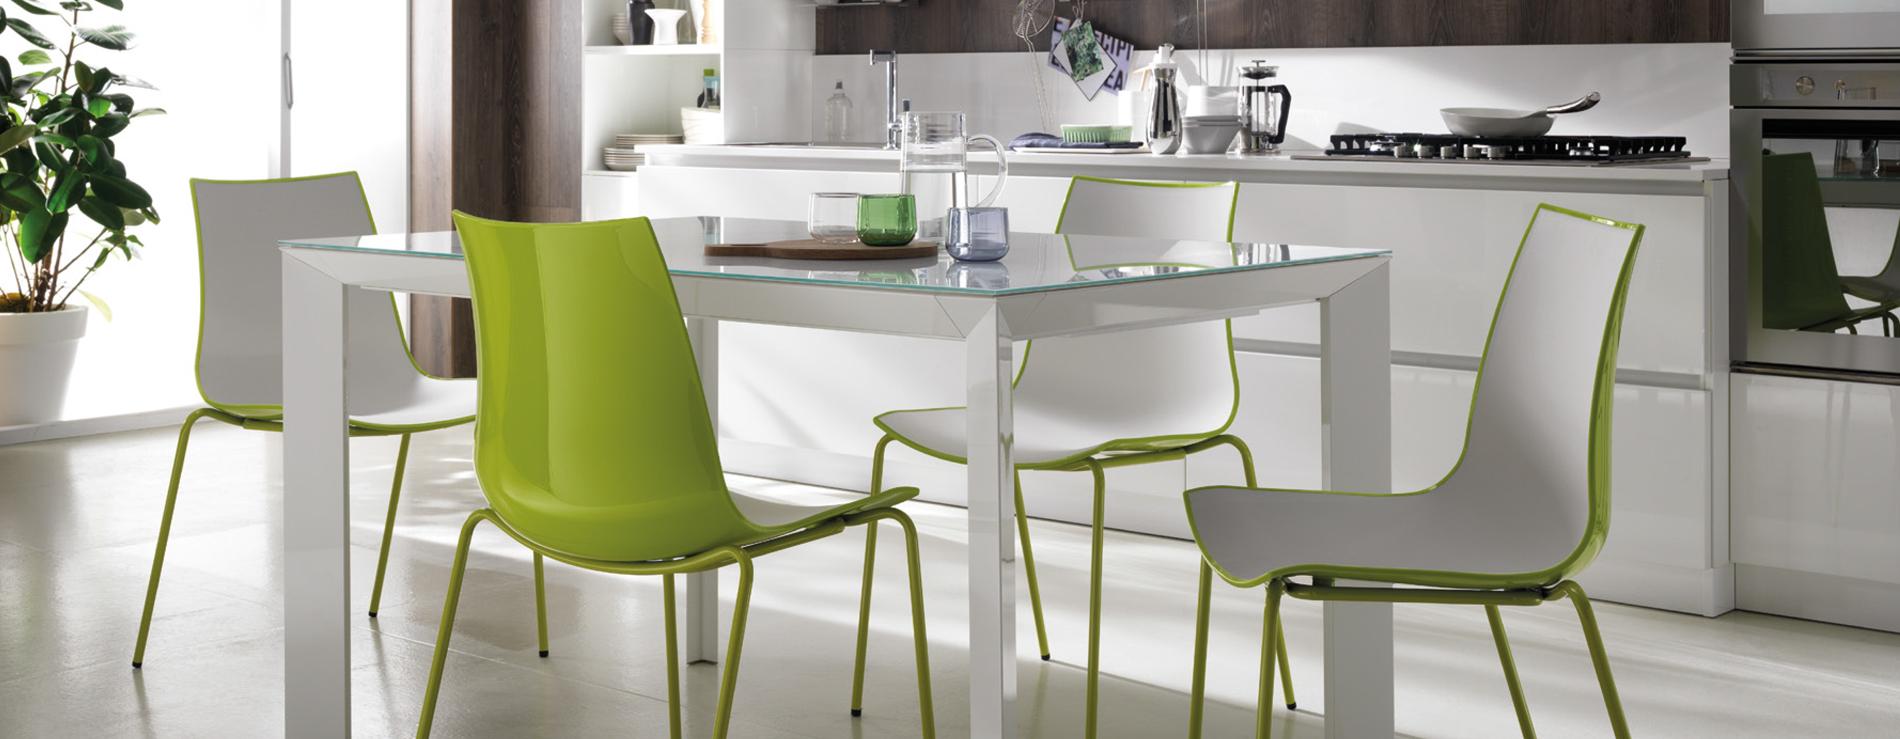 Tavoli sedie sgabelli moderni scavolini centro mobili for Tavoli da cucina moderni